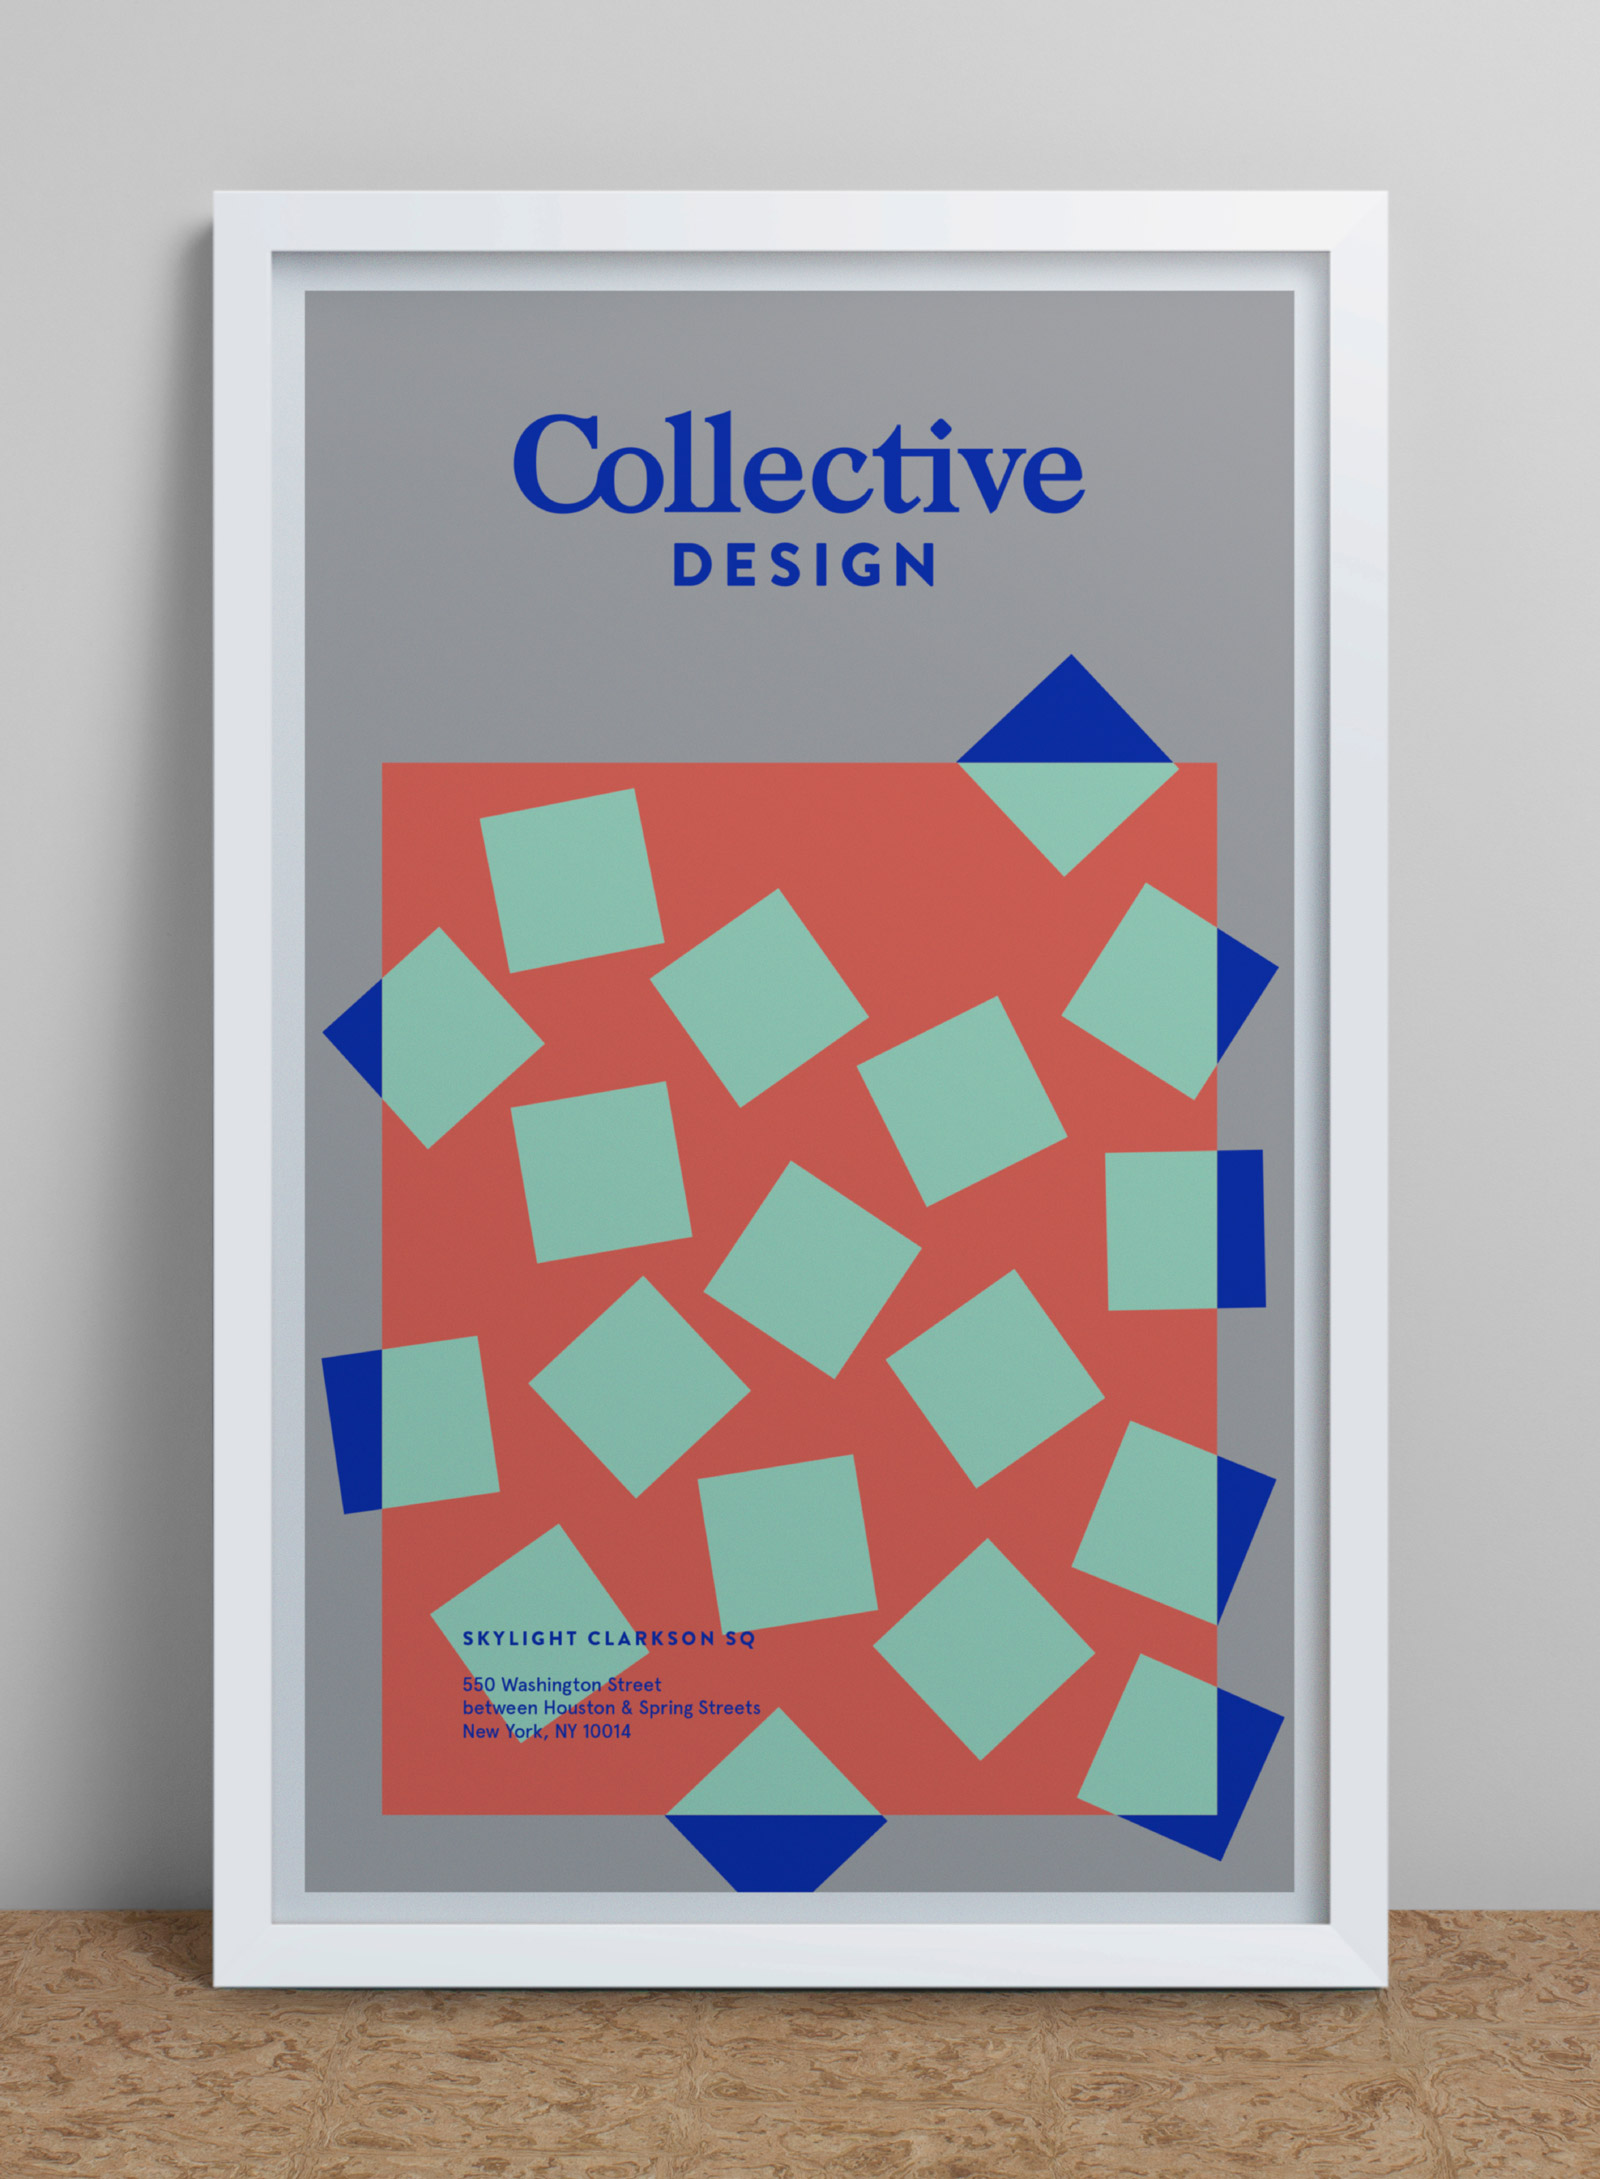 christiancervantes-collective-15.jpg